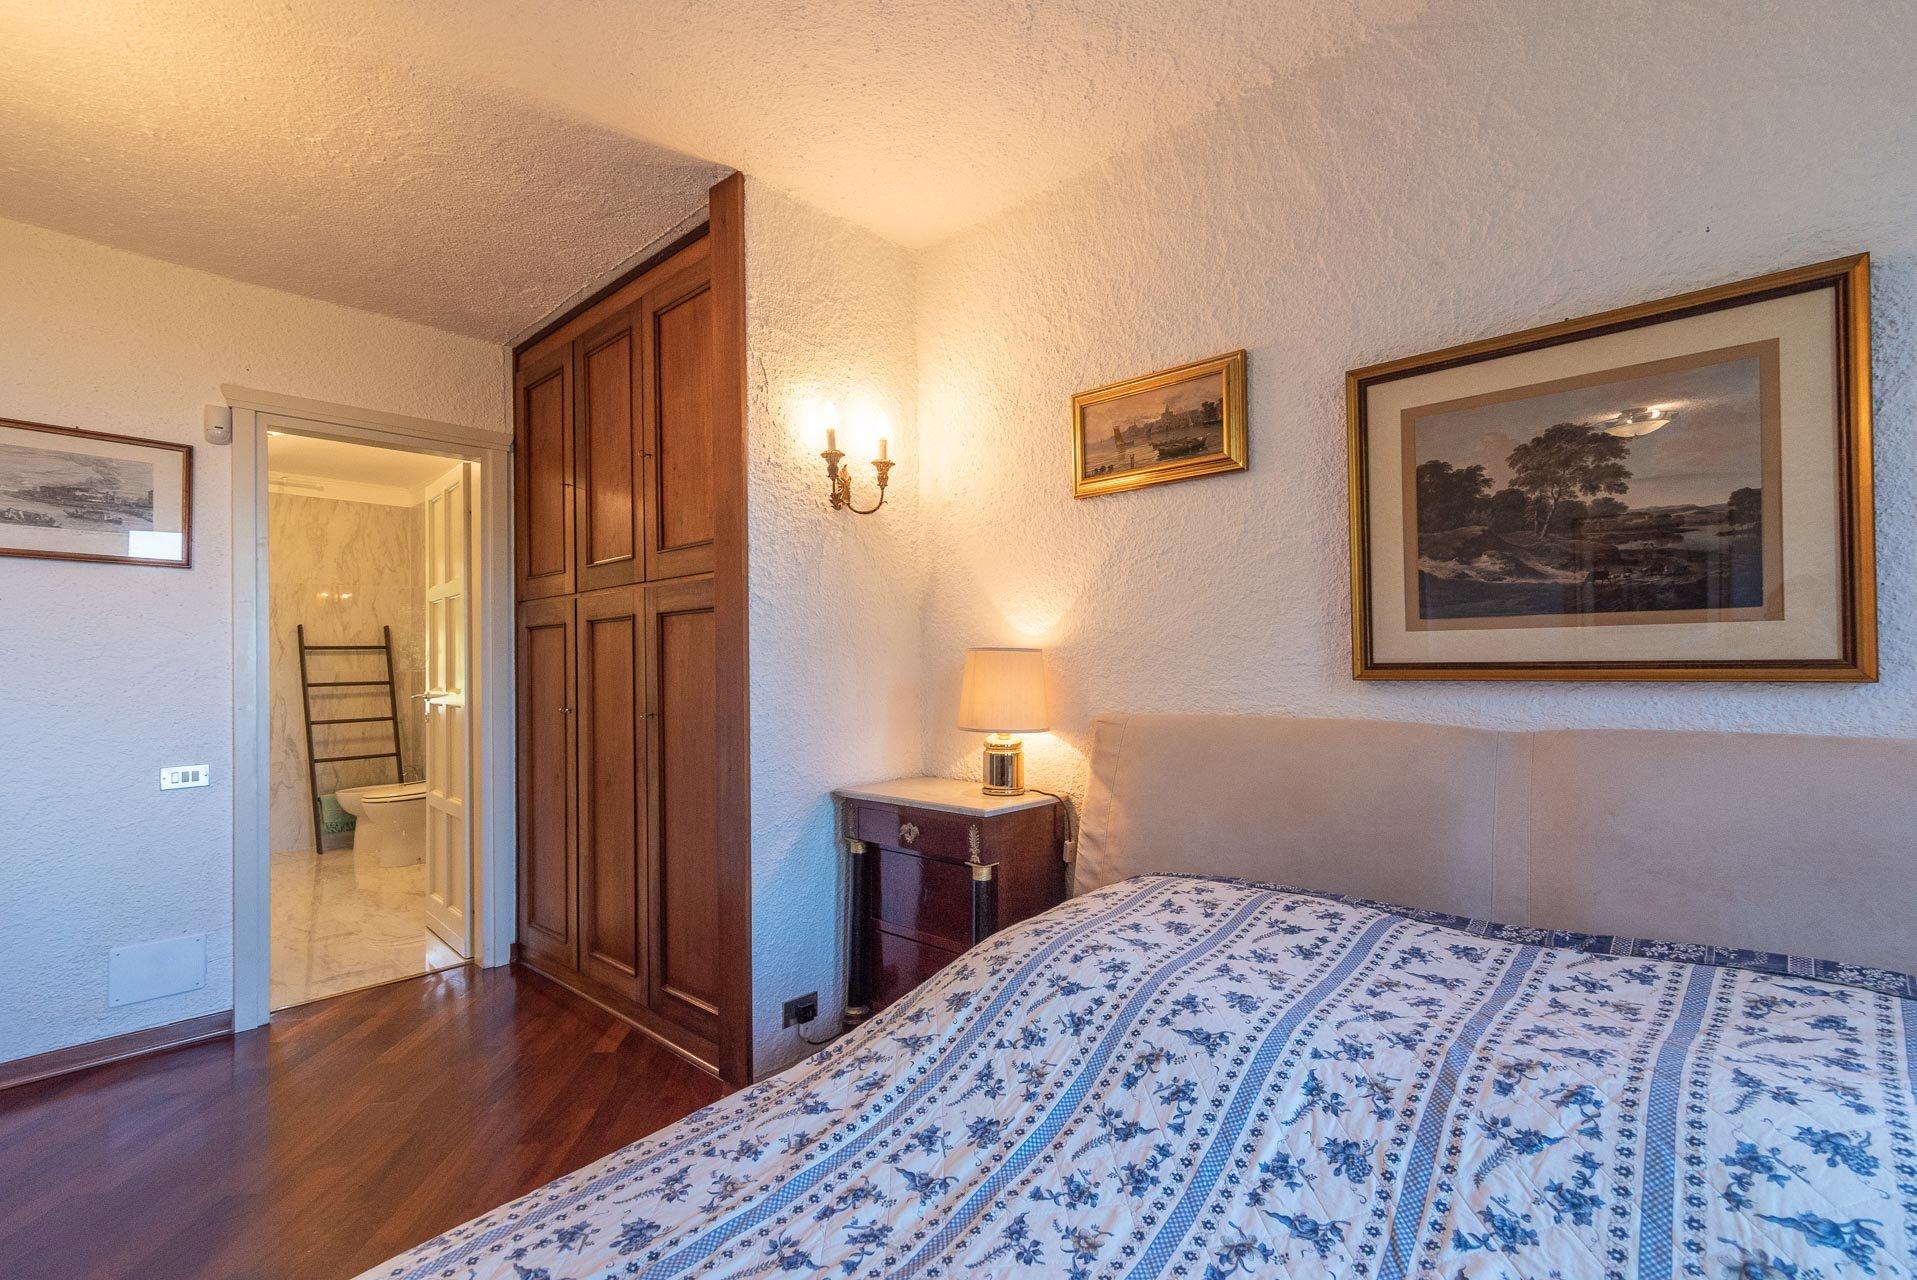 Villa con piscina in vendita a Gignese - guest bedroom